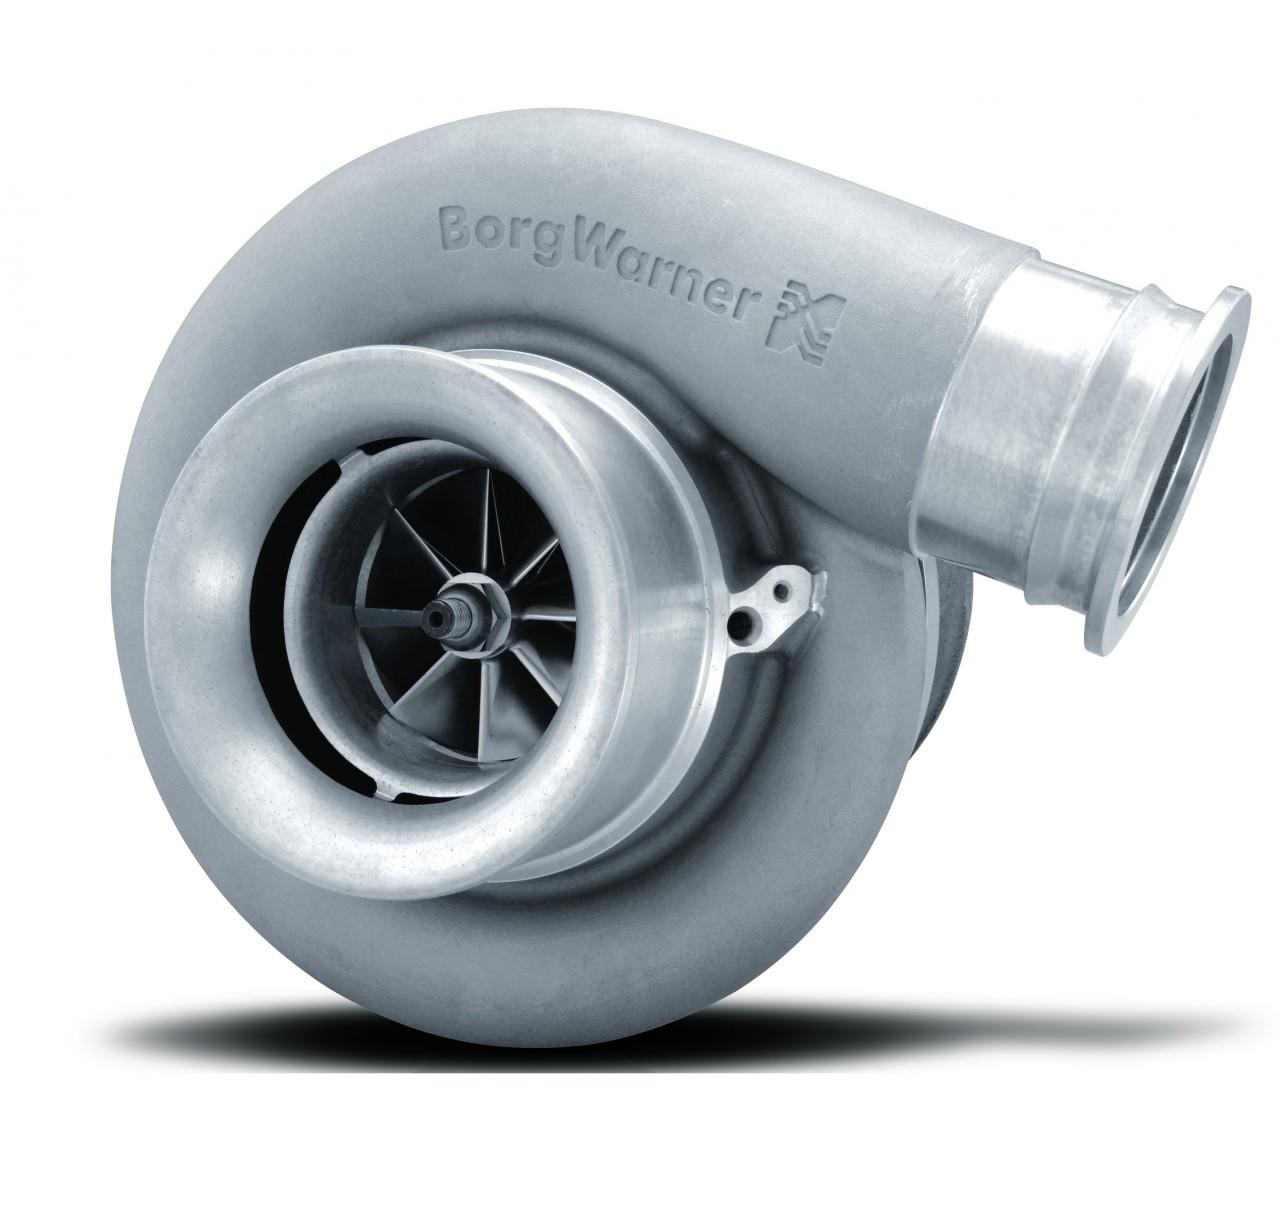 Agp Turbochargers Inc Store: Borg Warner S500SX Turbocharger (88mm)